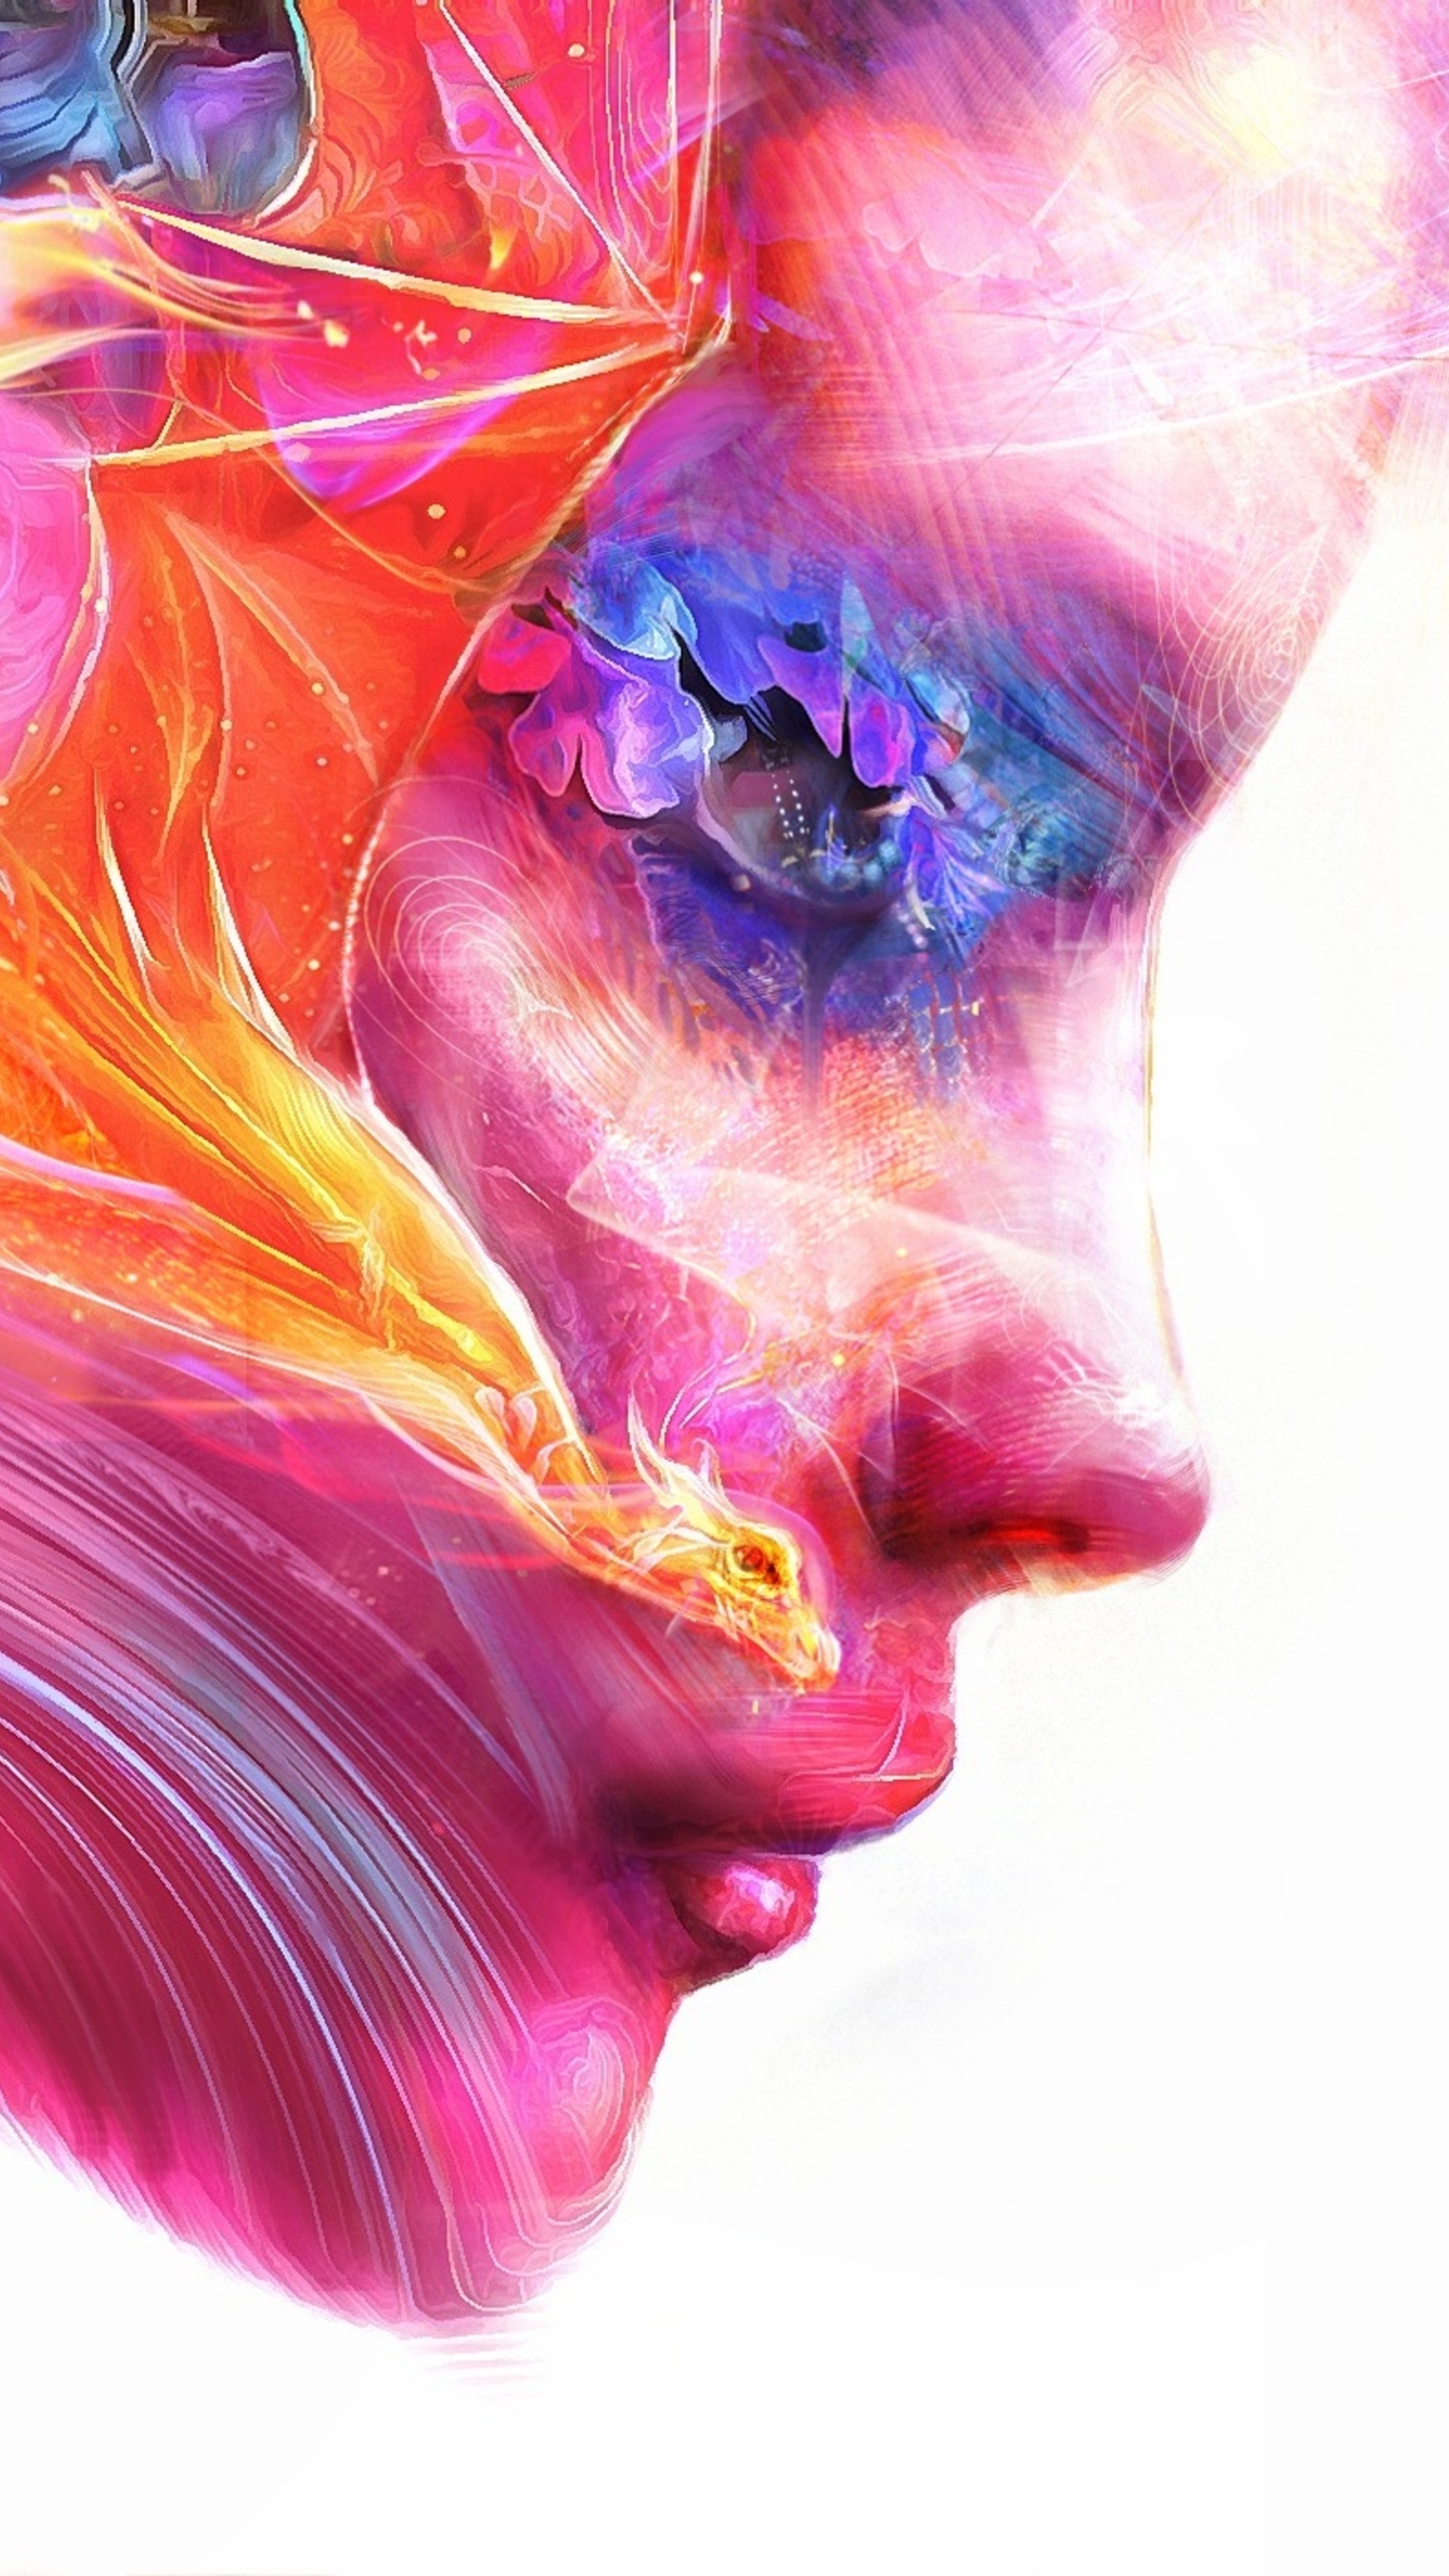 2160x3840 colorful women face artwork sony xperia x xz z5 - Art wallpaper 2160x3840 ...